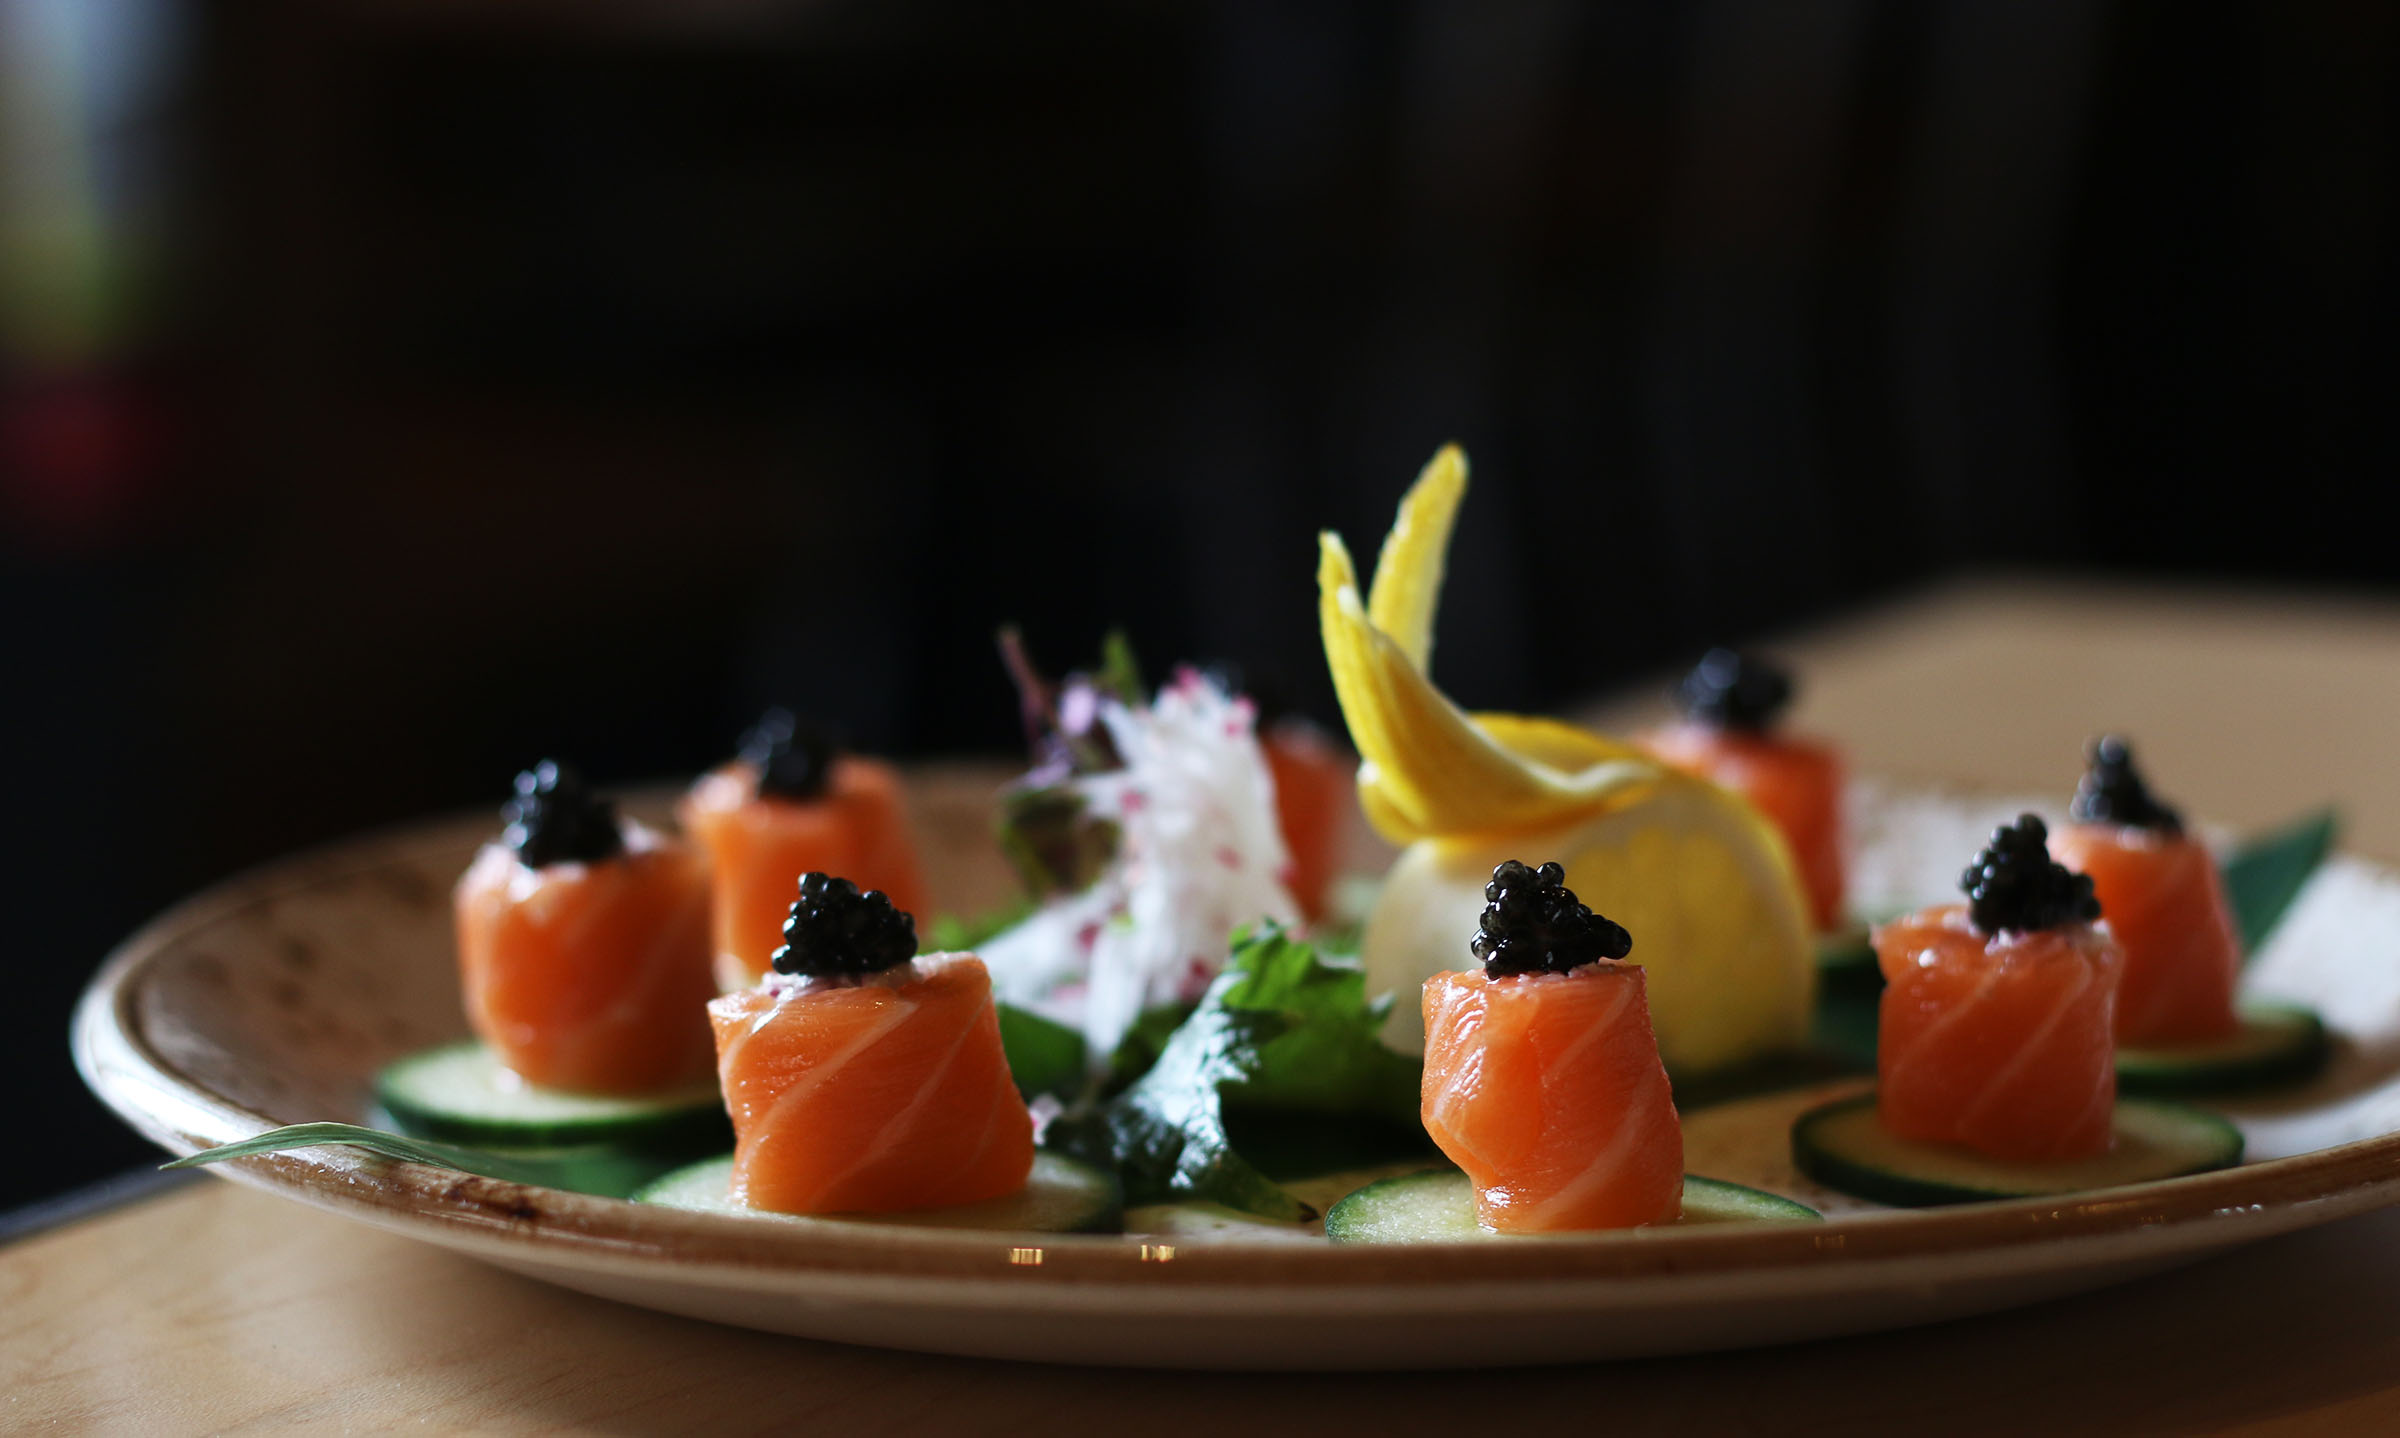 SALMON SASHIMI WITH CAVIAR: King salmon sashimi lightly rolled with Japanese onion chutney, topped with wild American paddlefish caviar on a cucumber crisp.